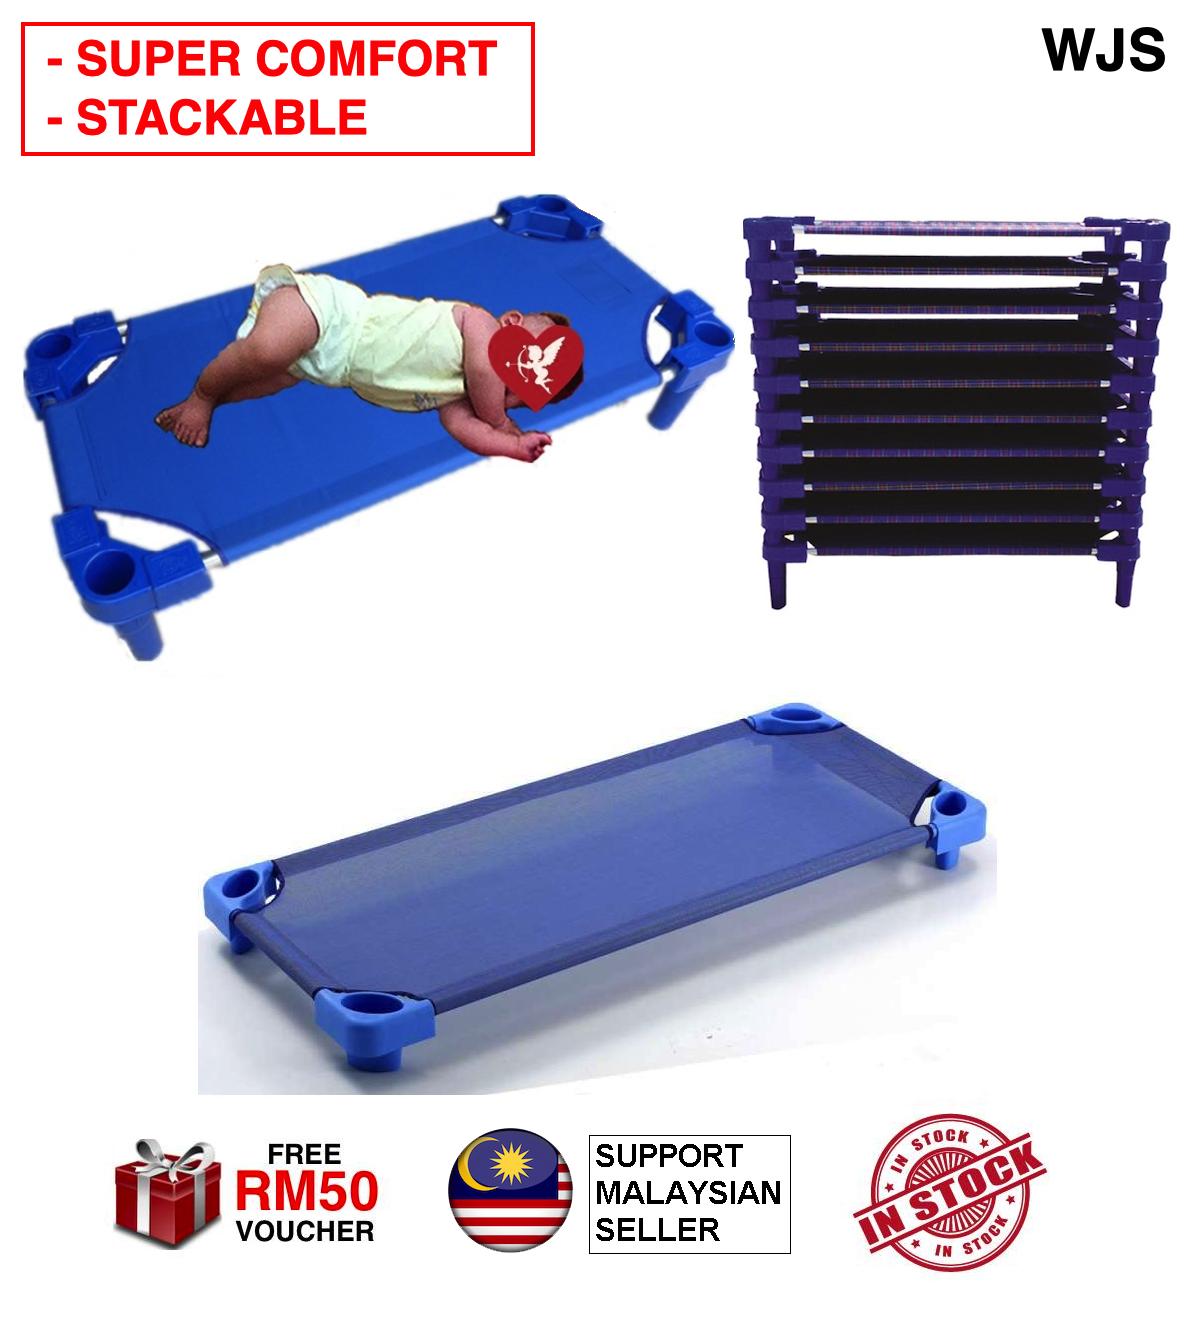 (ENHANCED STEEL) WJS XL Safety First Portable Kids Bed Canvas Bed Stackable Kindergarden Nursery Tadika Bed Cot Mattress Portable Katil Kanak-Kanak BLUE CHEQUERED [FREE RM 50 VOUCHER]